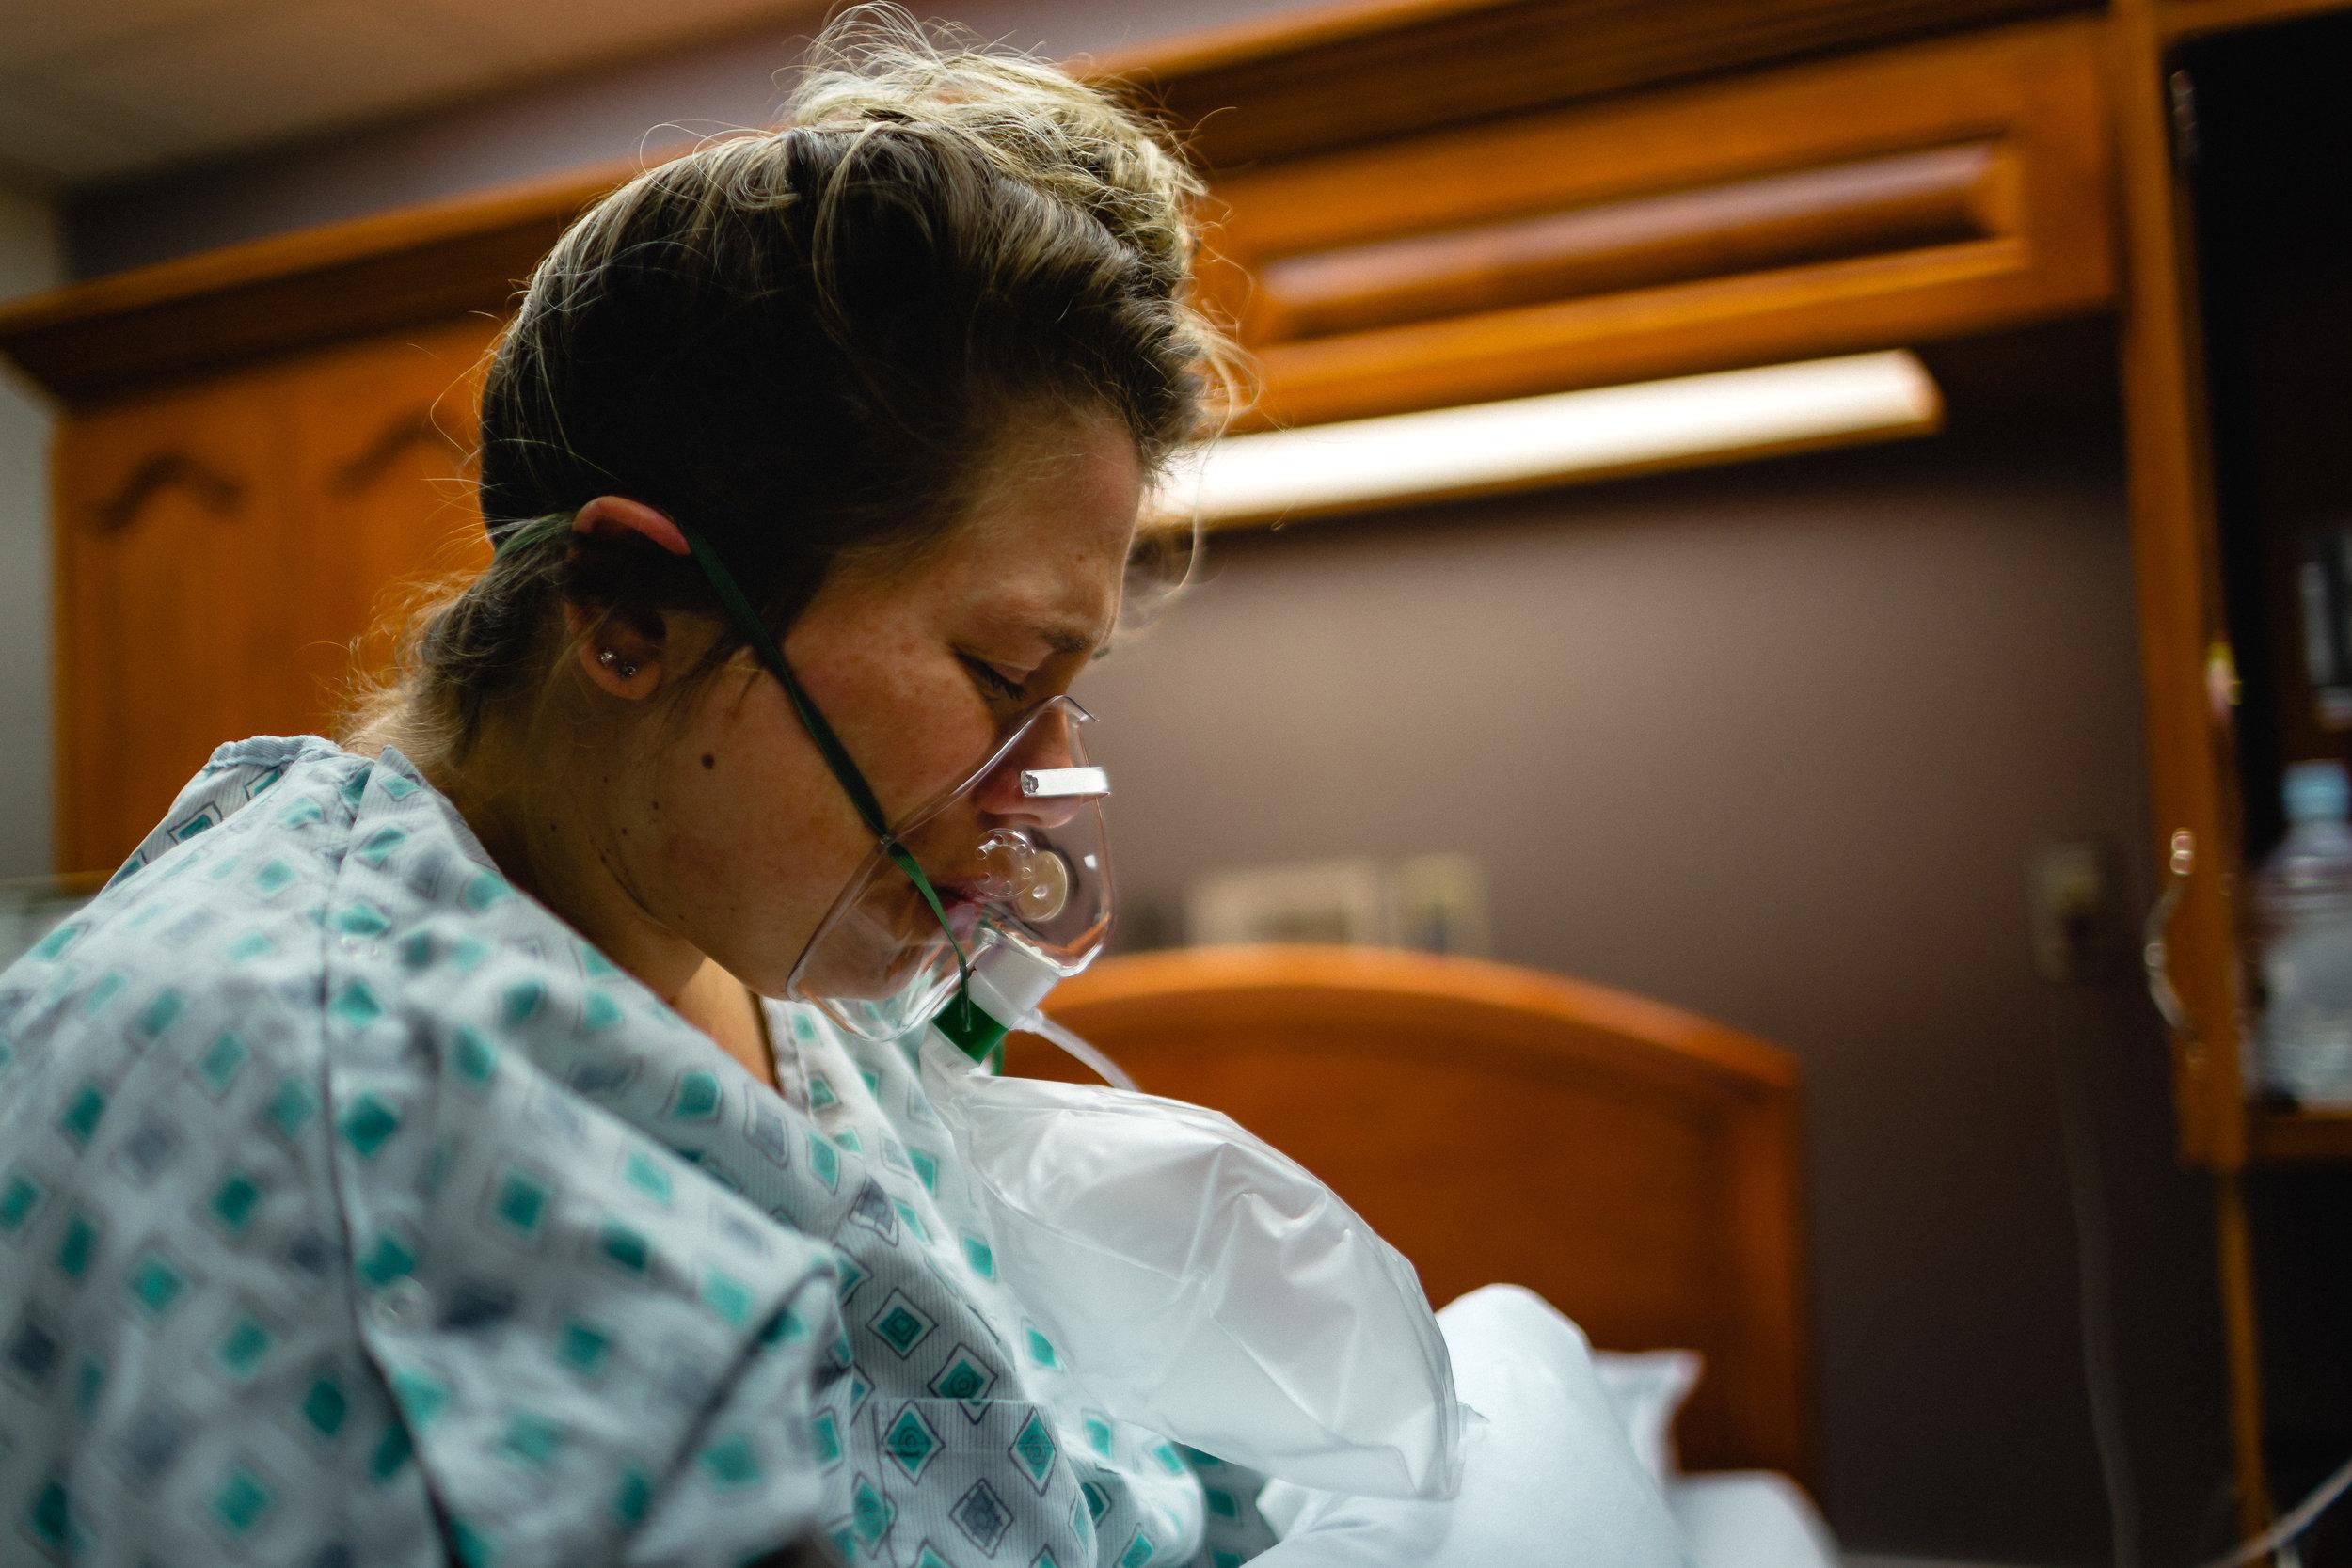 laboring woman missuori birth photography